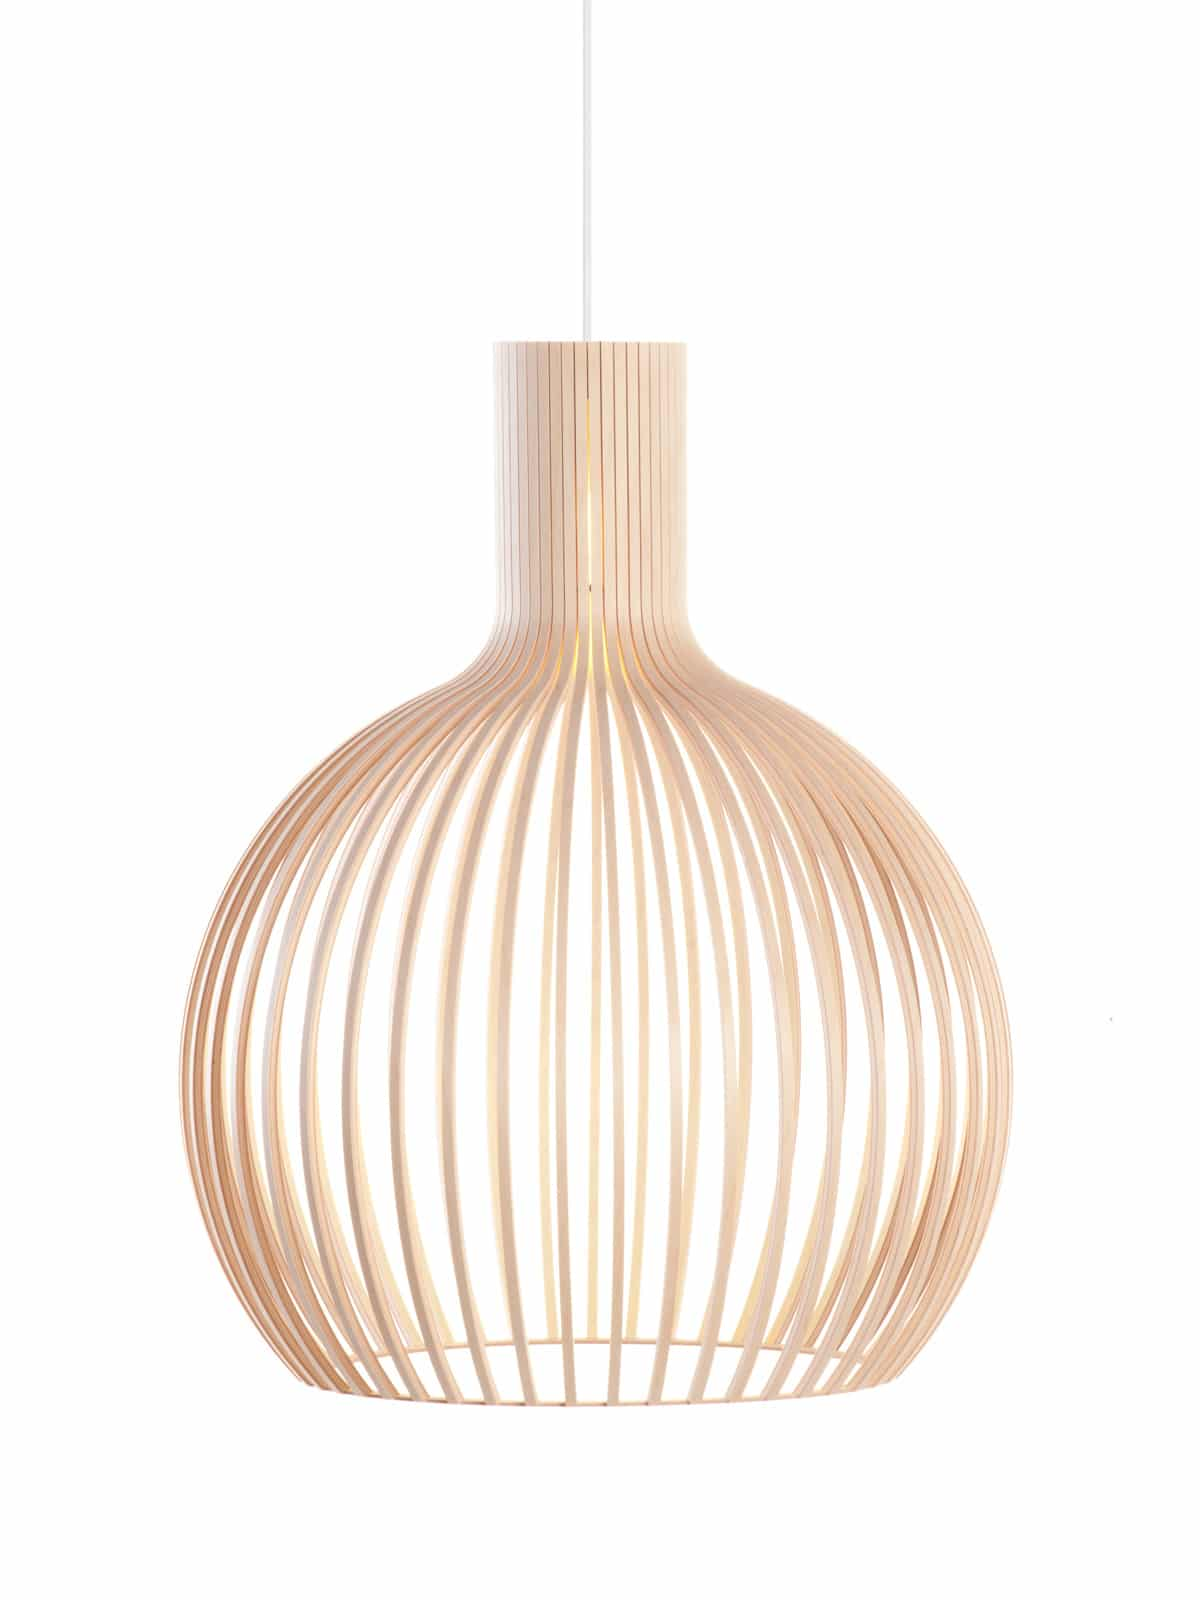 Octo 4240 secto design lampen leuchten designerleuchten for Replica leuchten